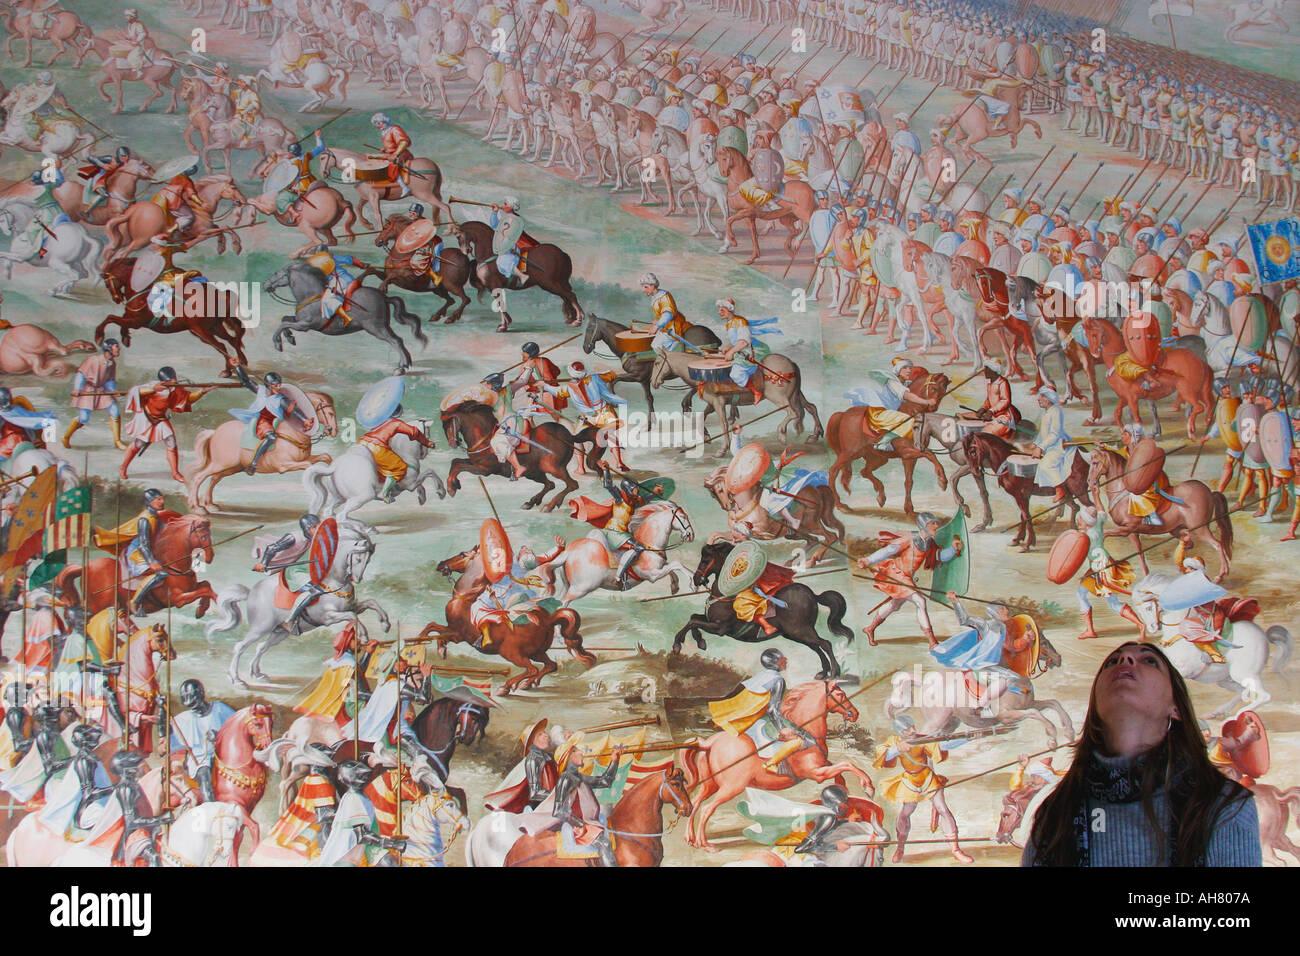 San Lorenzo de El Escorial Madrid Province Spain Section of mural in Hall of Battles - Stock Image